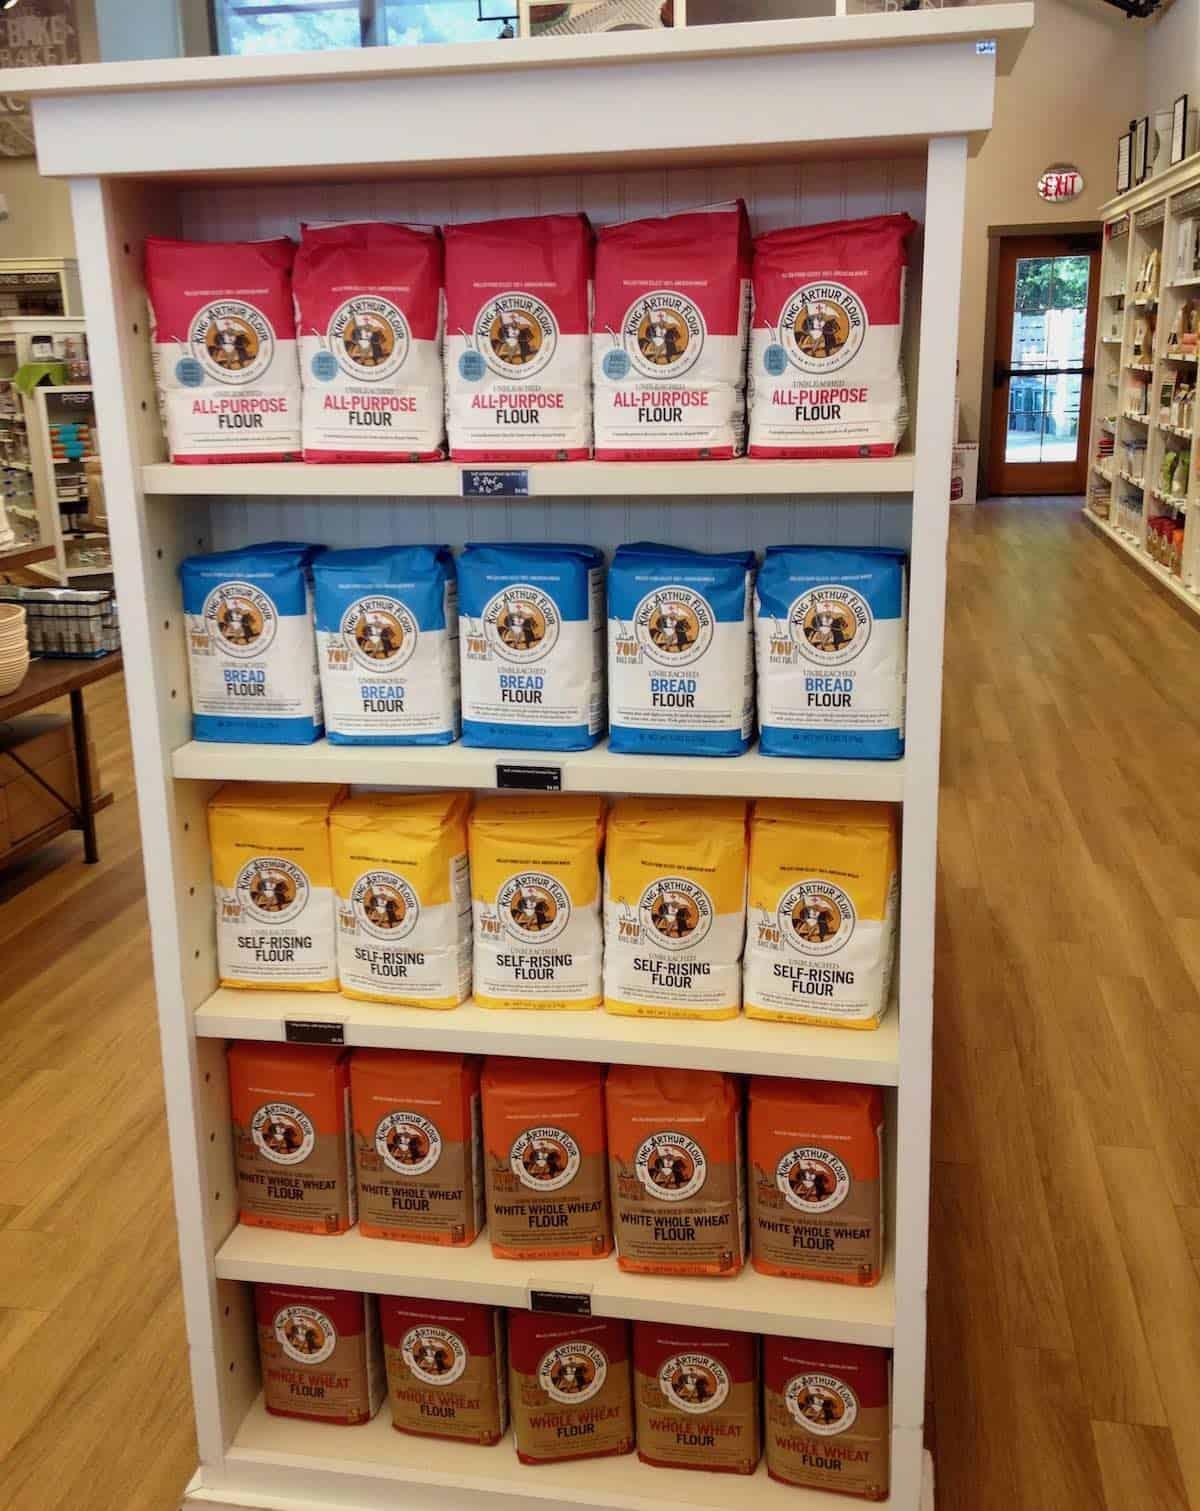 King Arthur Flour brands